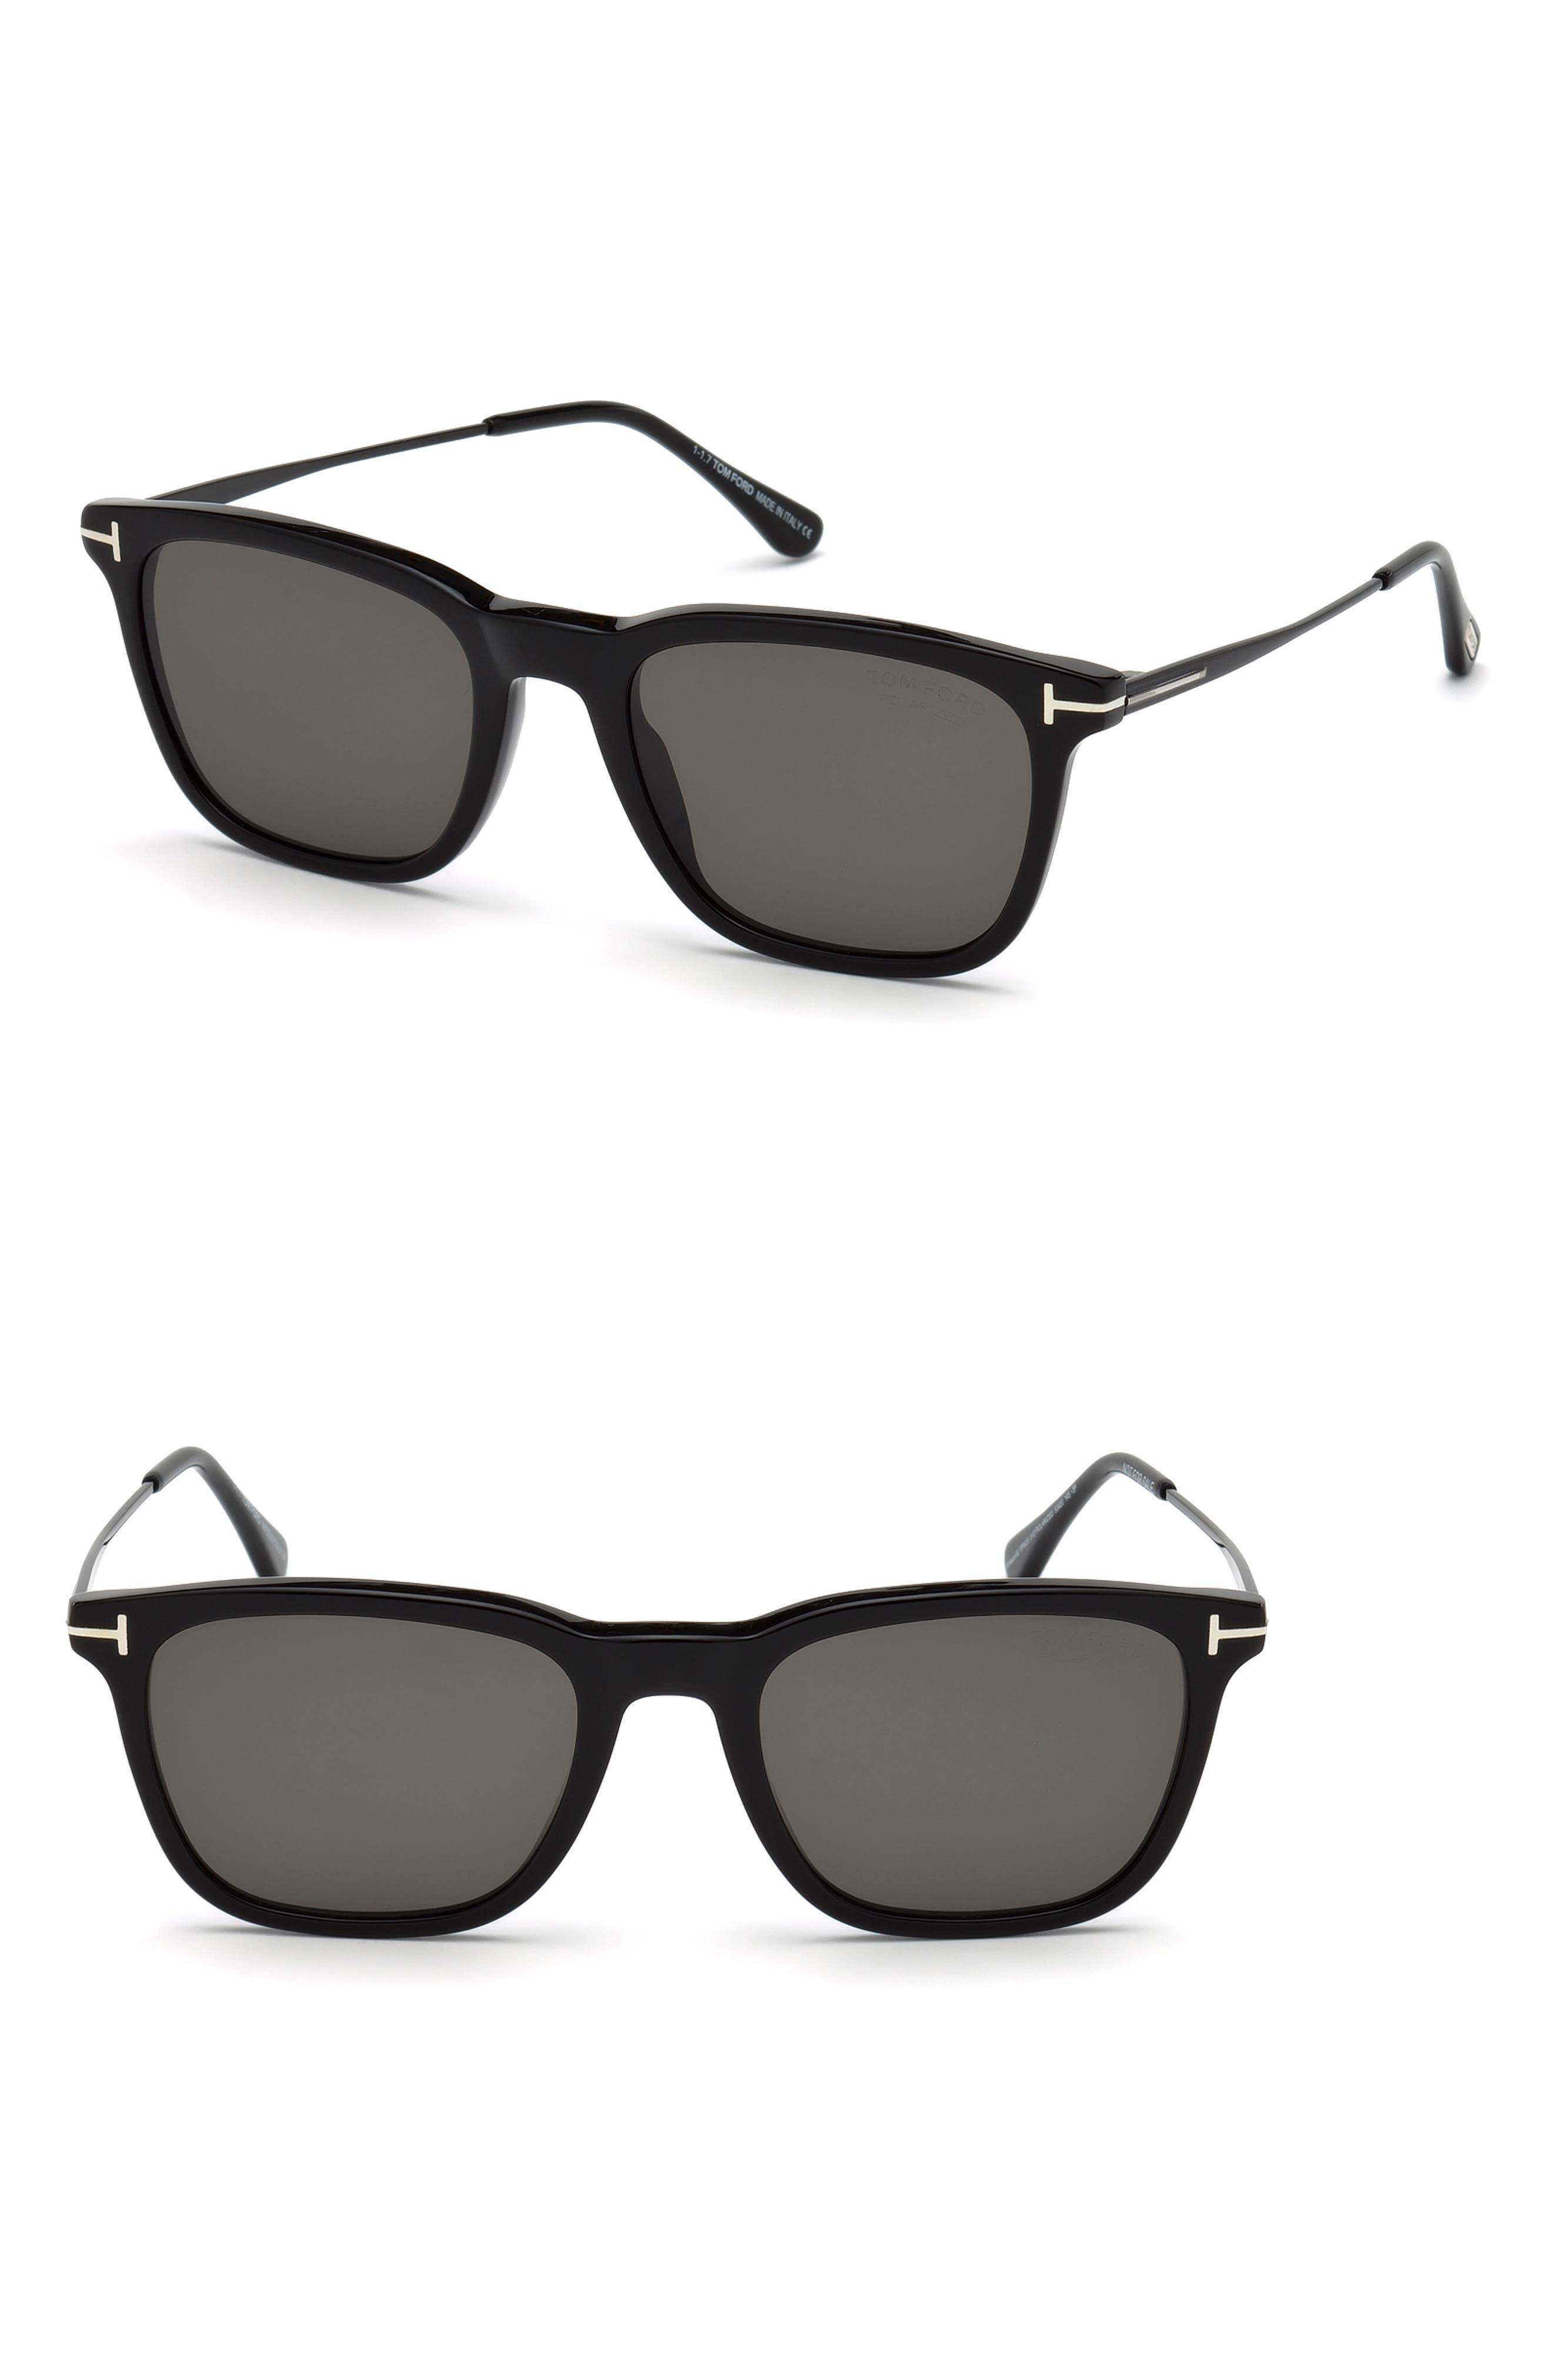 Arnaud 53mm Polarized Sunglasses,                             Main thumbnail 1, color,                             SHINY BLACK / SMOKE POLARIZED